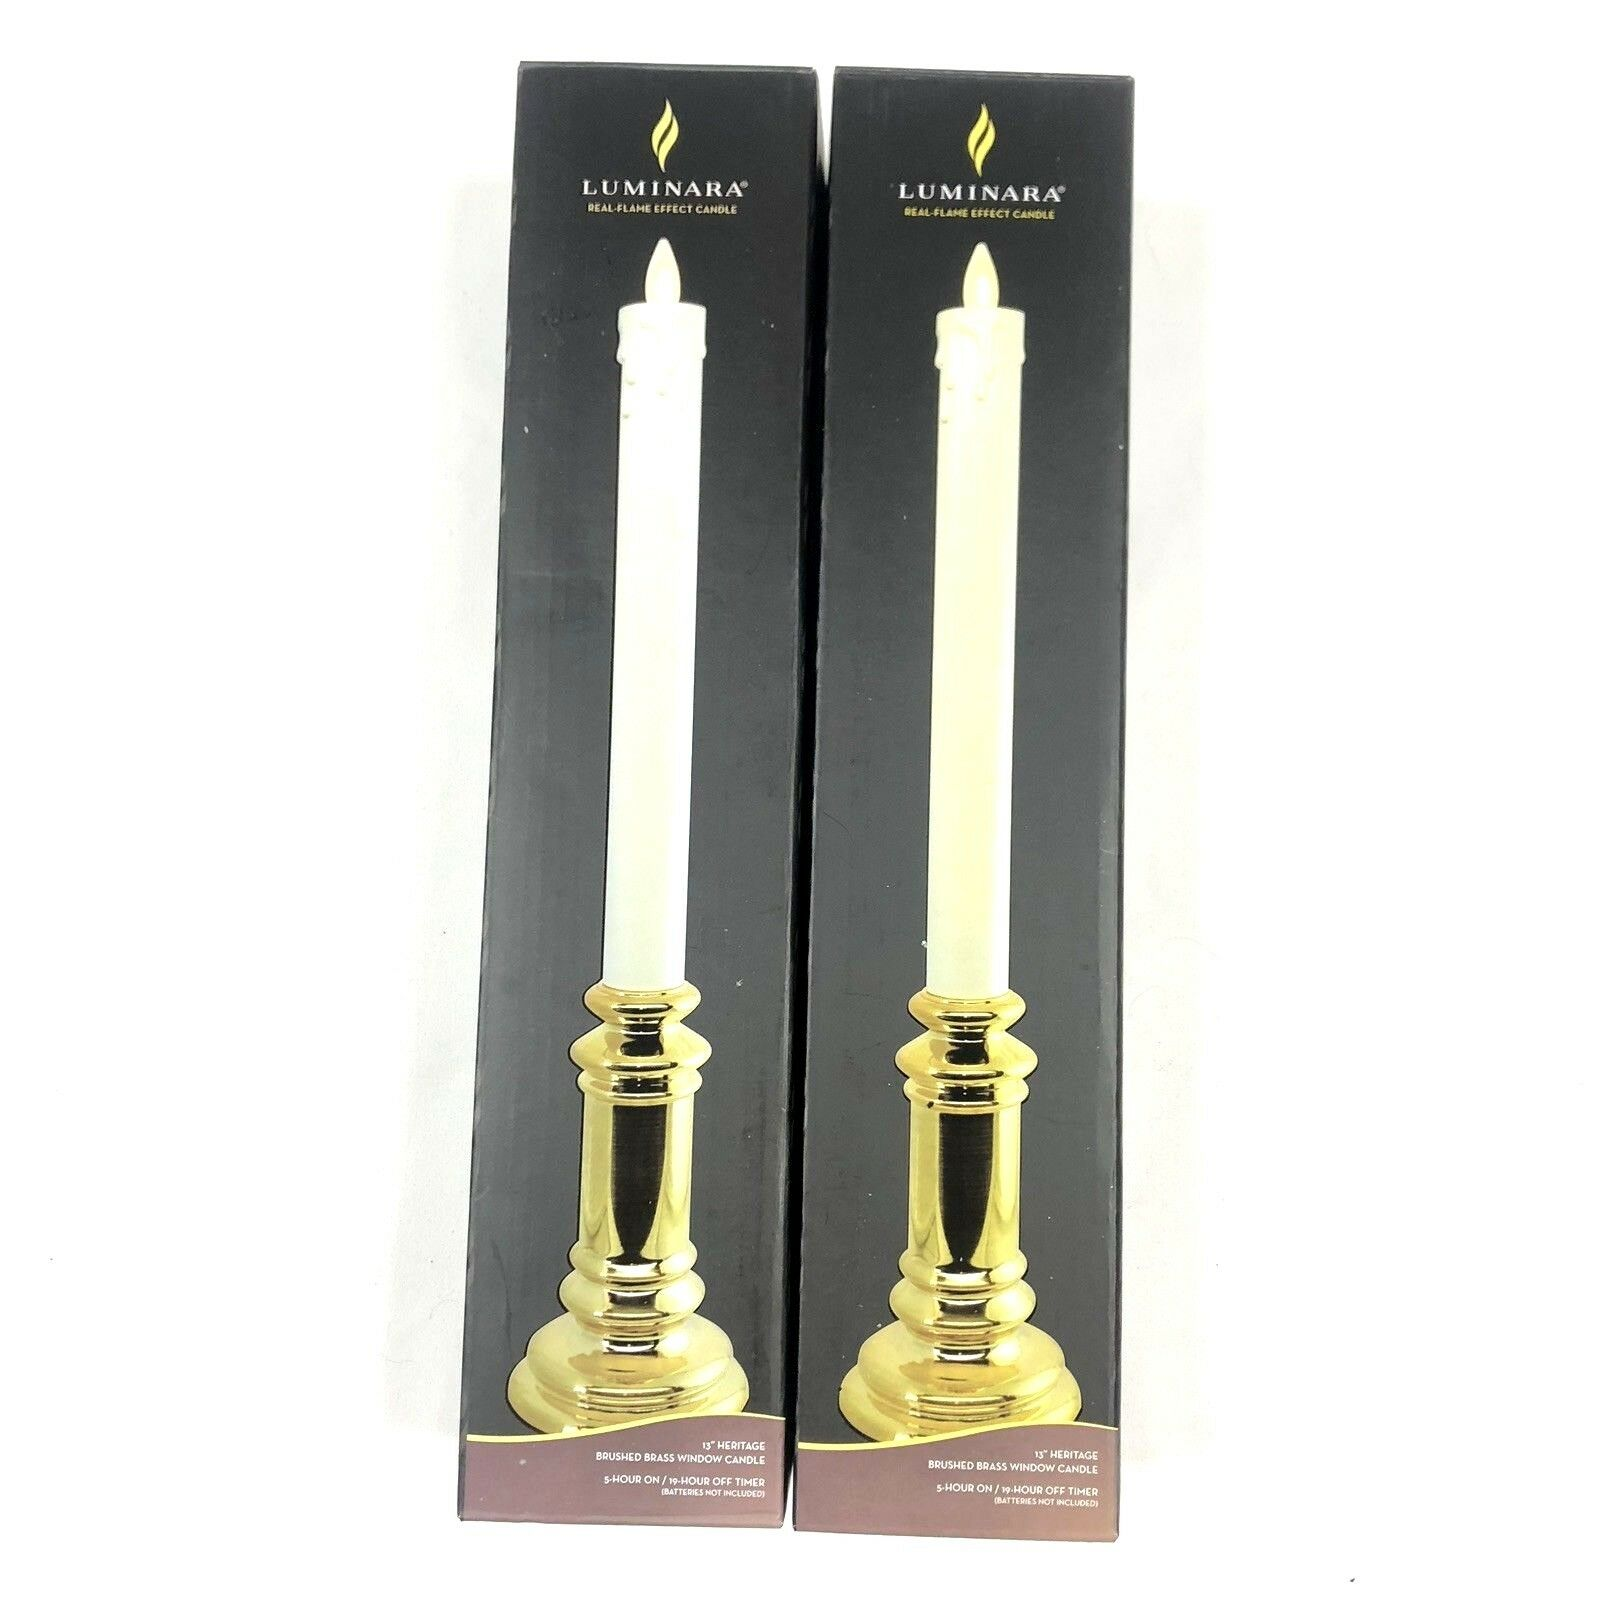 NEW Luminara Heritage pair 2 ivory shiny Gold flame effect candlestick candles